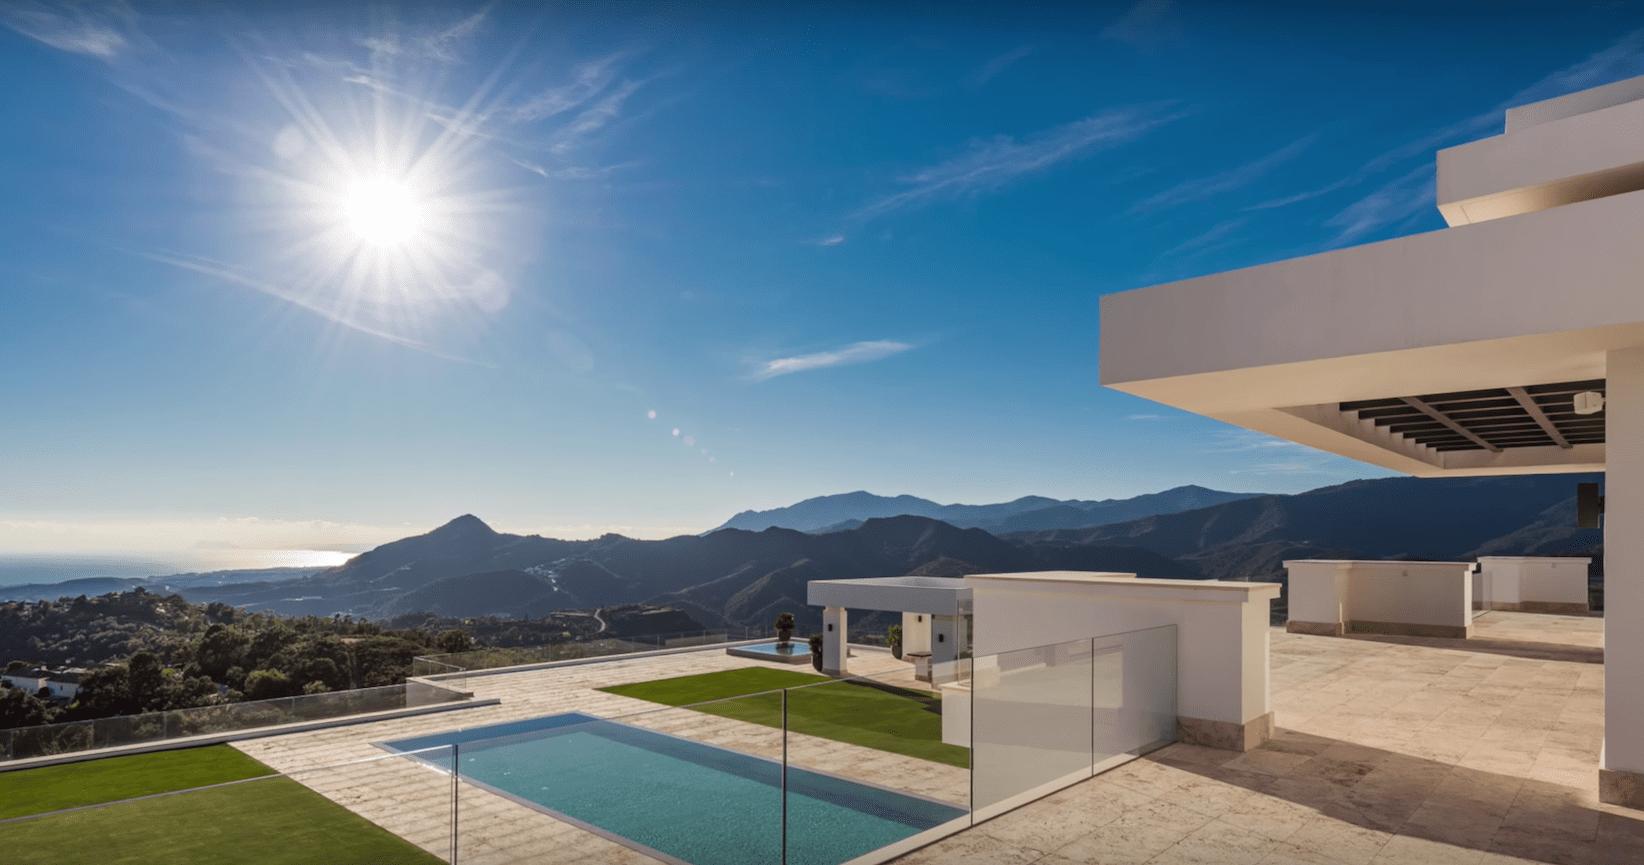 La zagaleta brand new modern mansion for sale for Modern mansions for sale